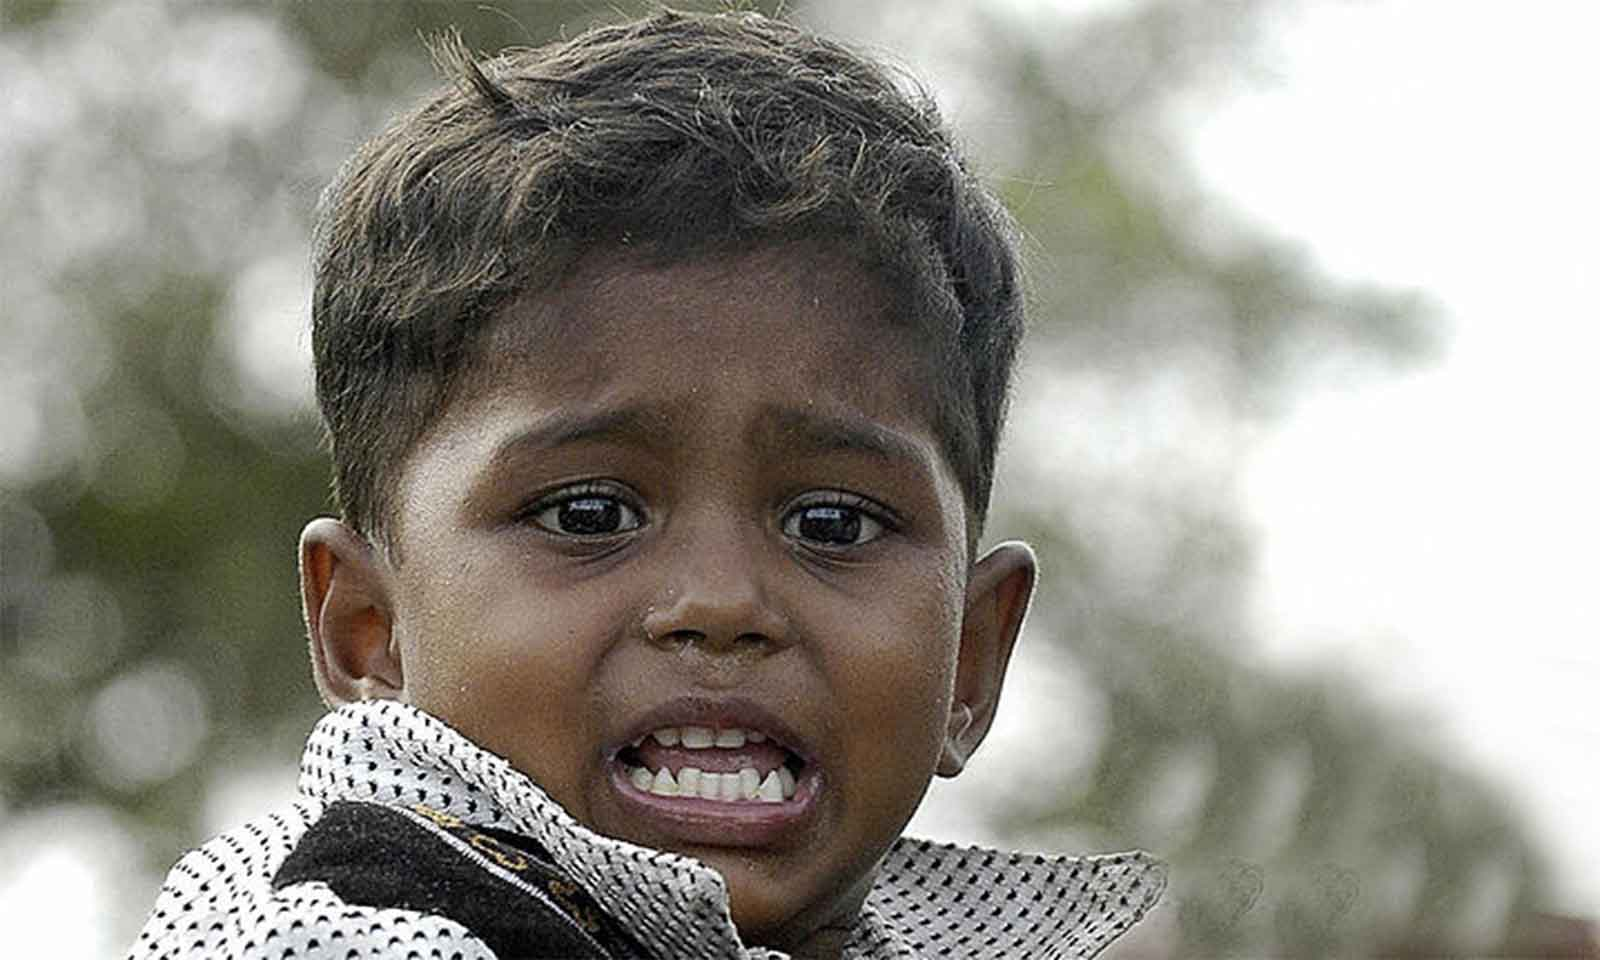 Kanishtha Kishore Sahu's odia story for children Singha Badhiba